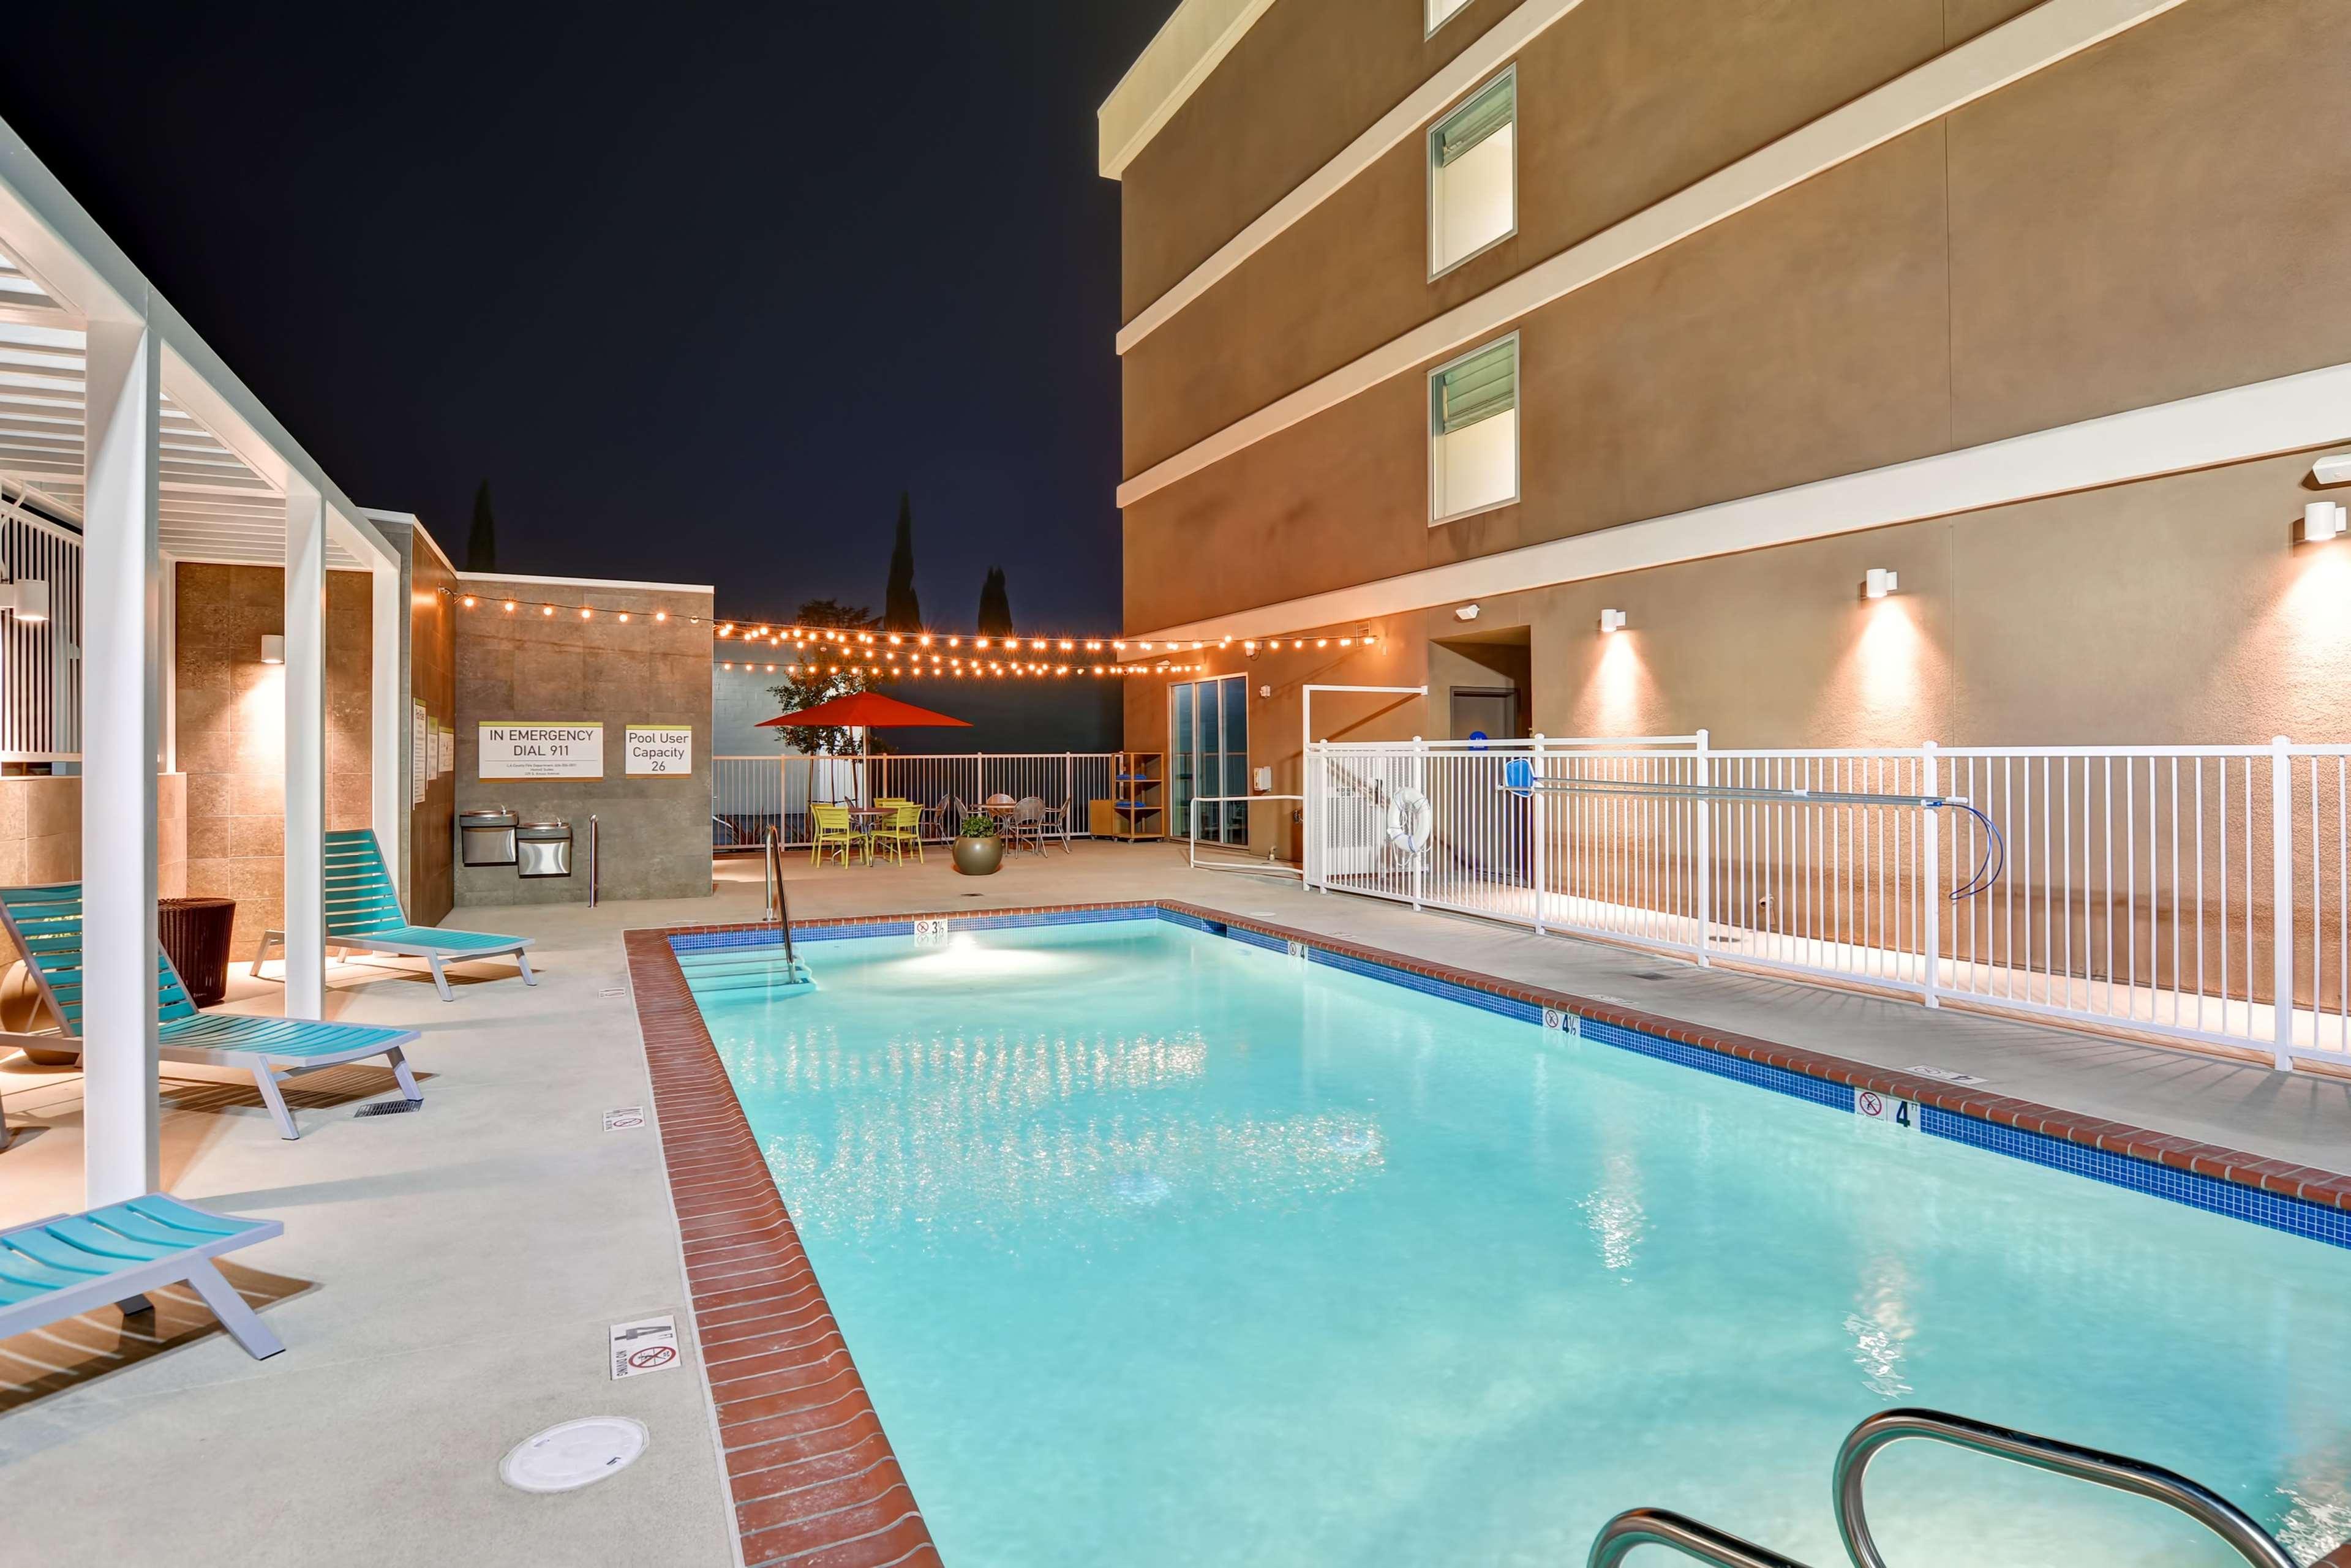 Home2 Suites by Hilton Azusa image 18